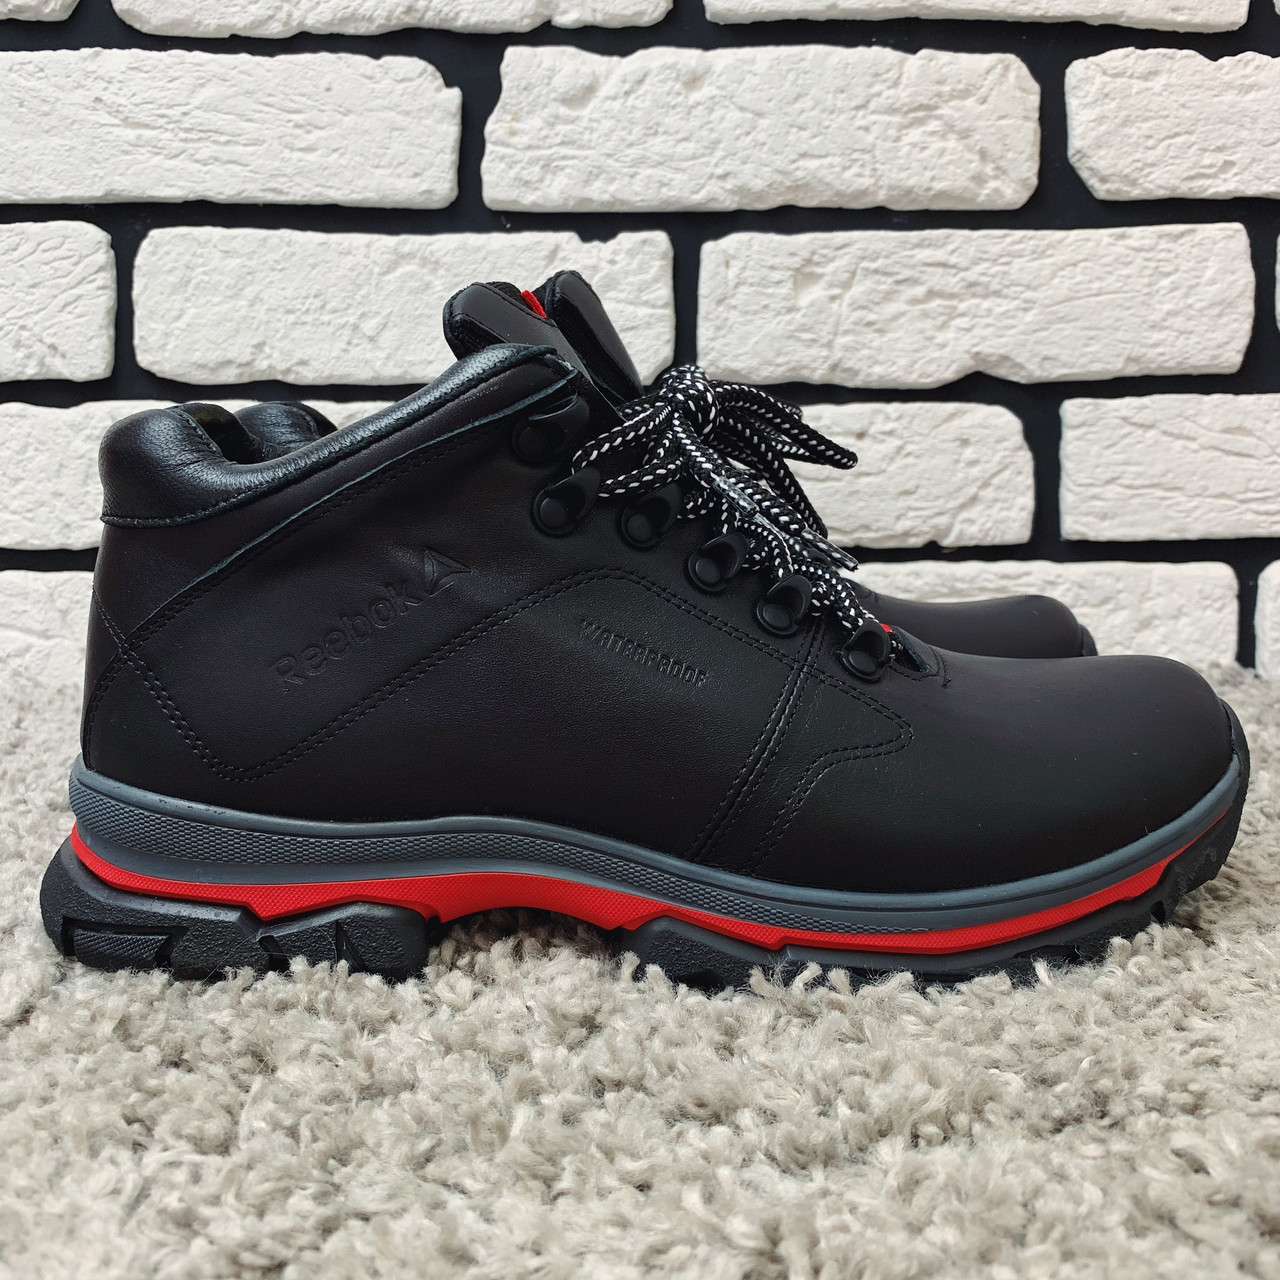 Зимние ботинки (на меху) мужские Reebok  13060 ⏩ [41,42,45 ]